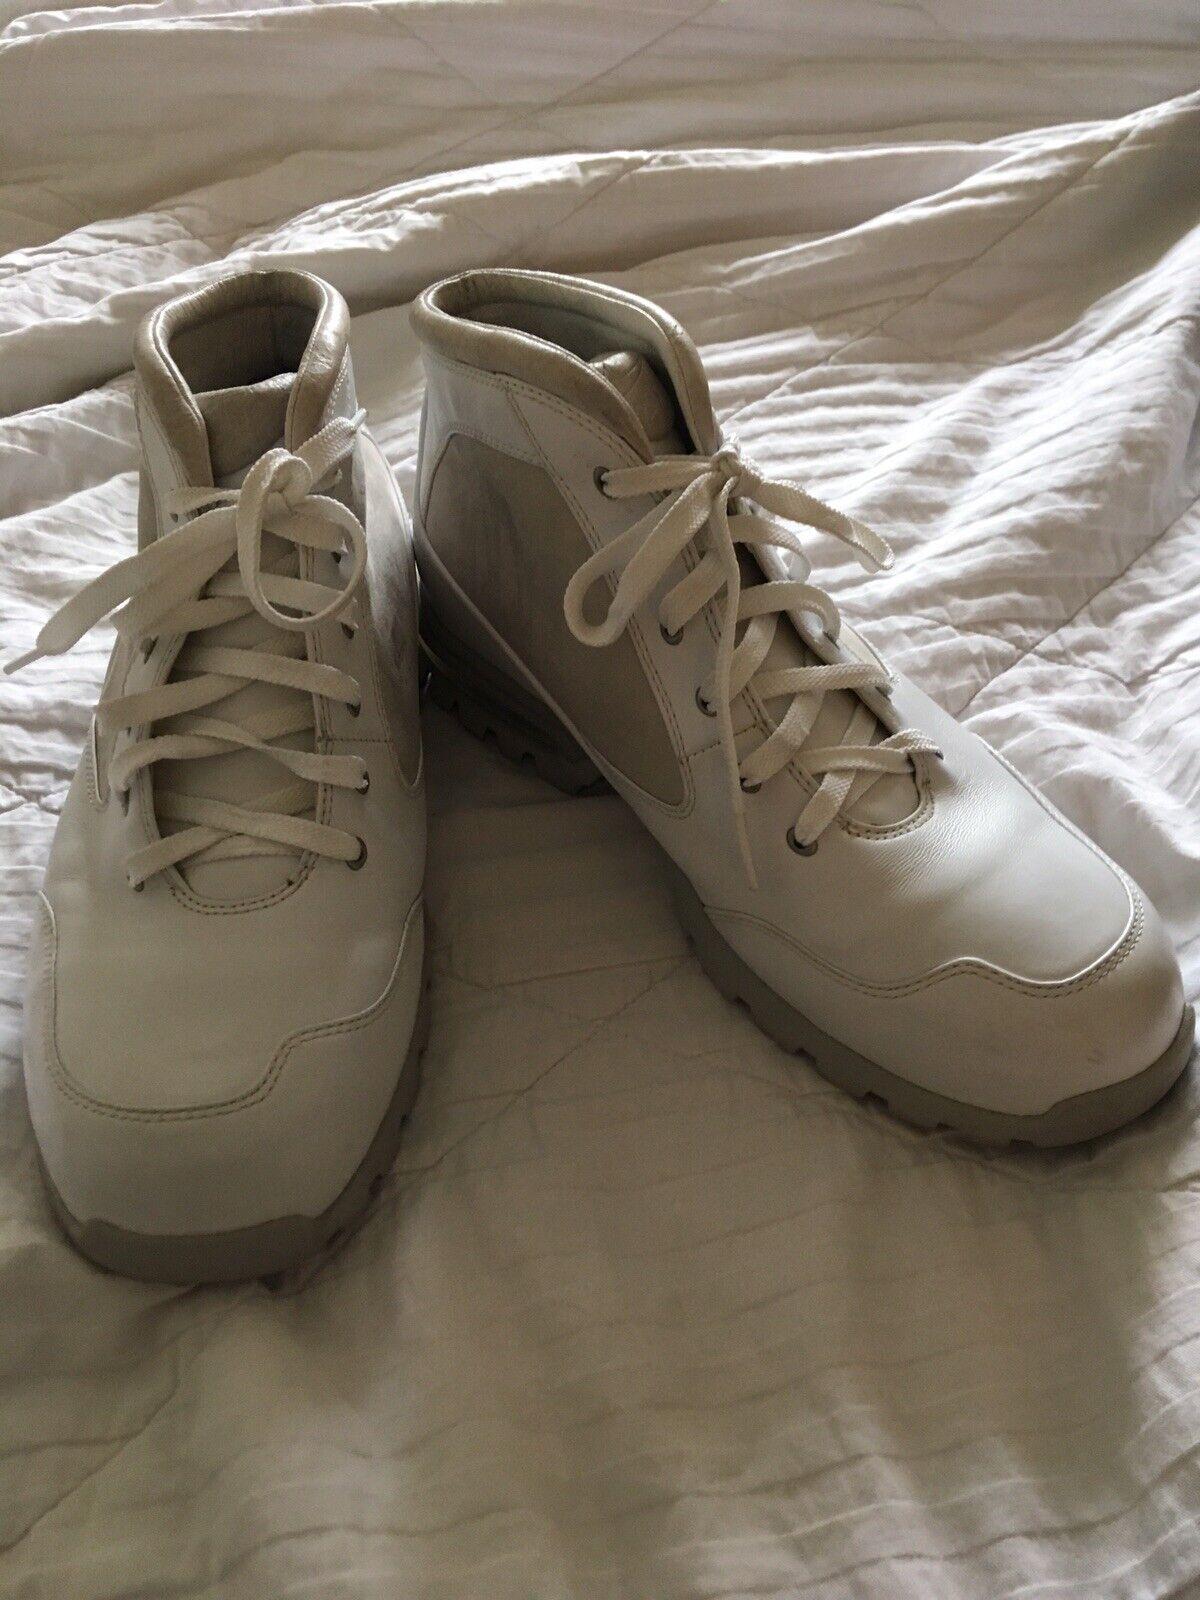 Nike Air Max Goadome White Men's Boots Vintage